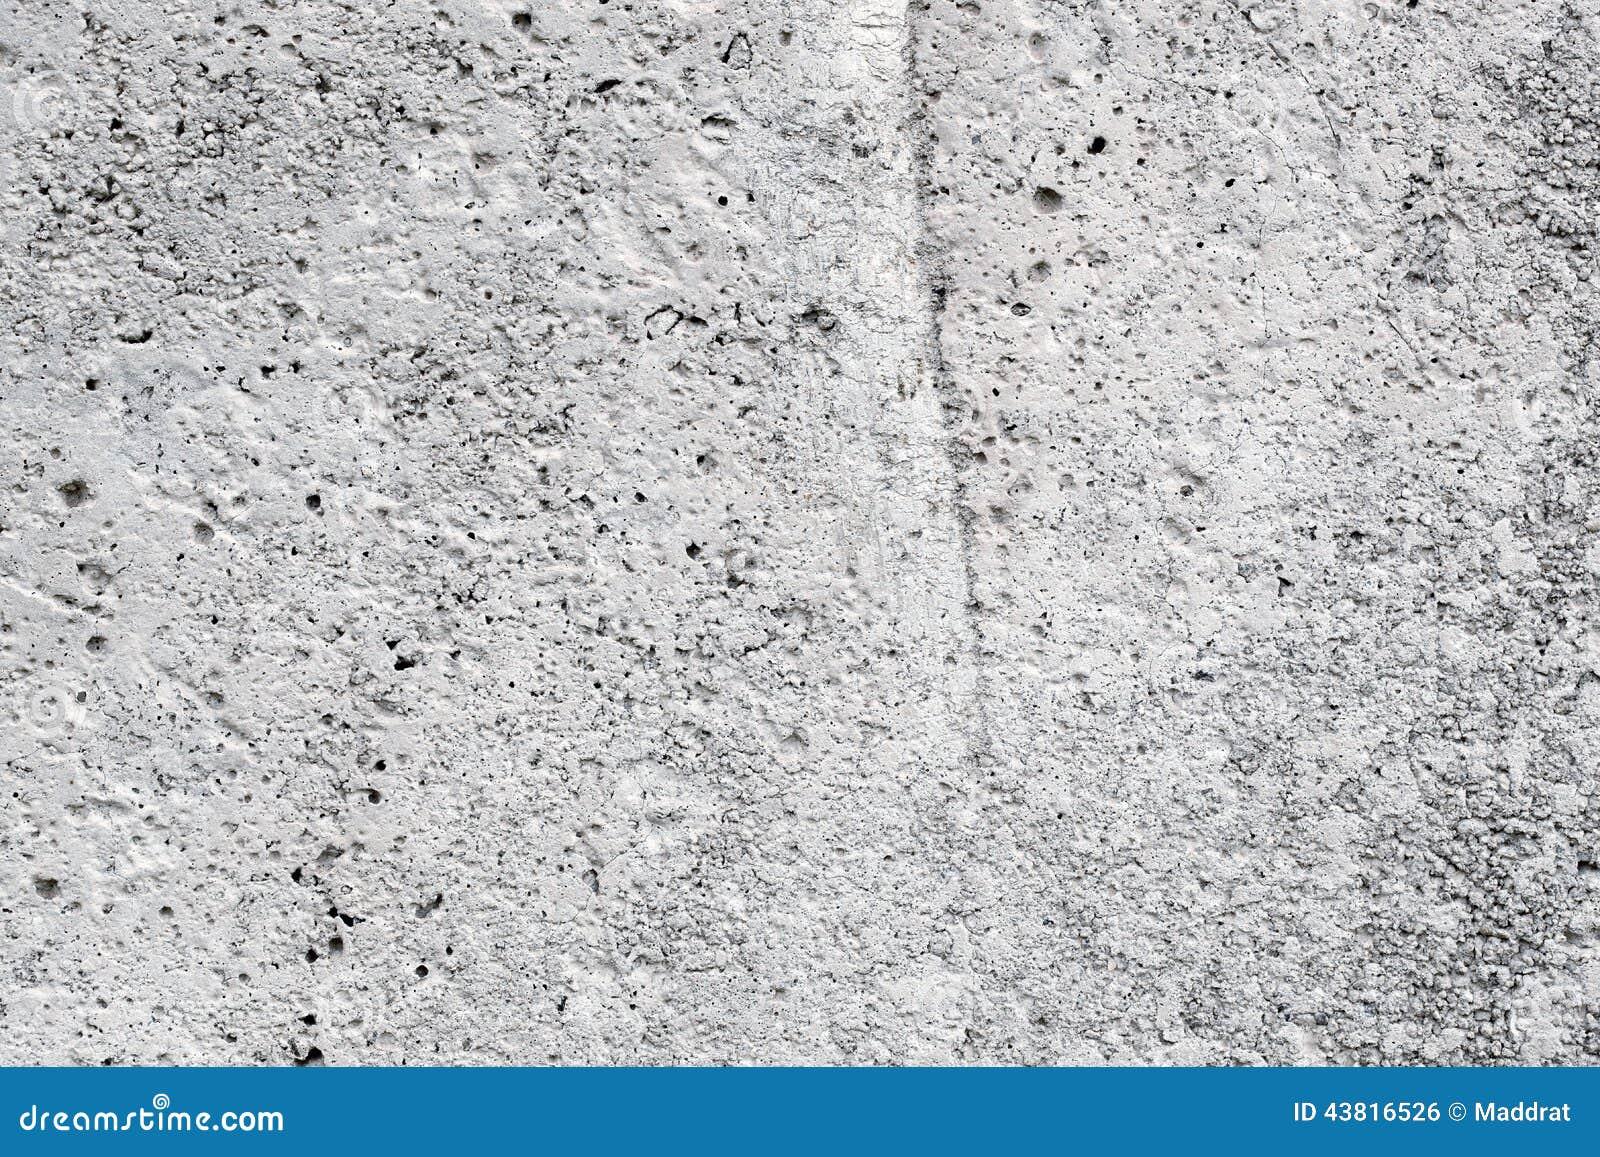 Concrete Material Texture Stock Photo Image 43816526